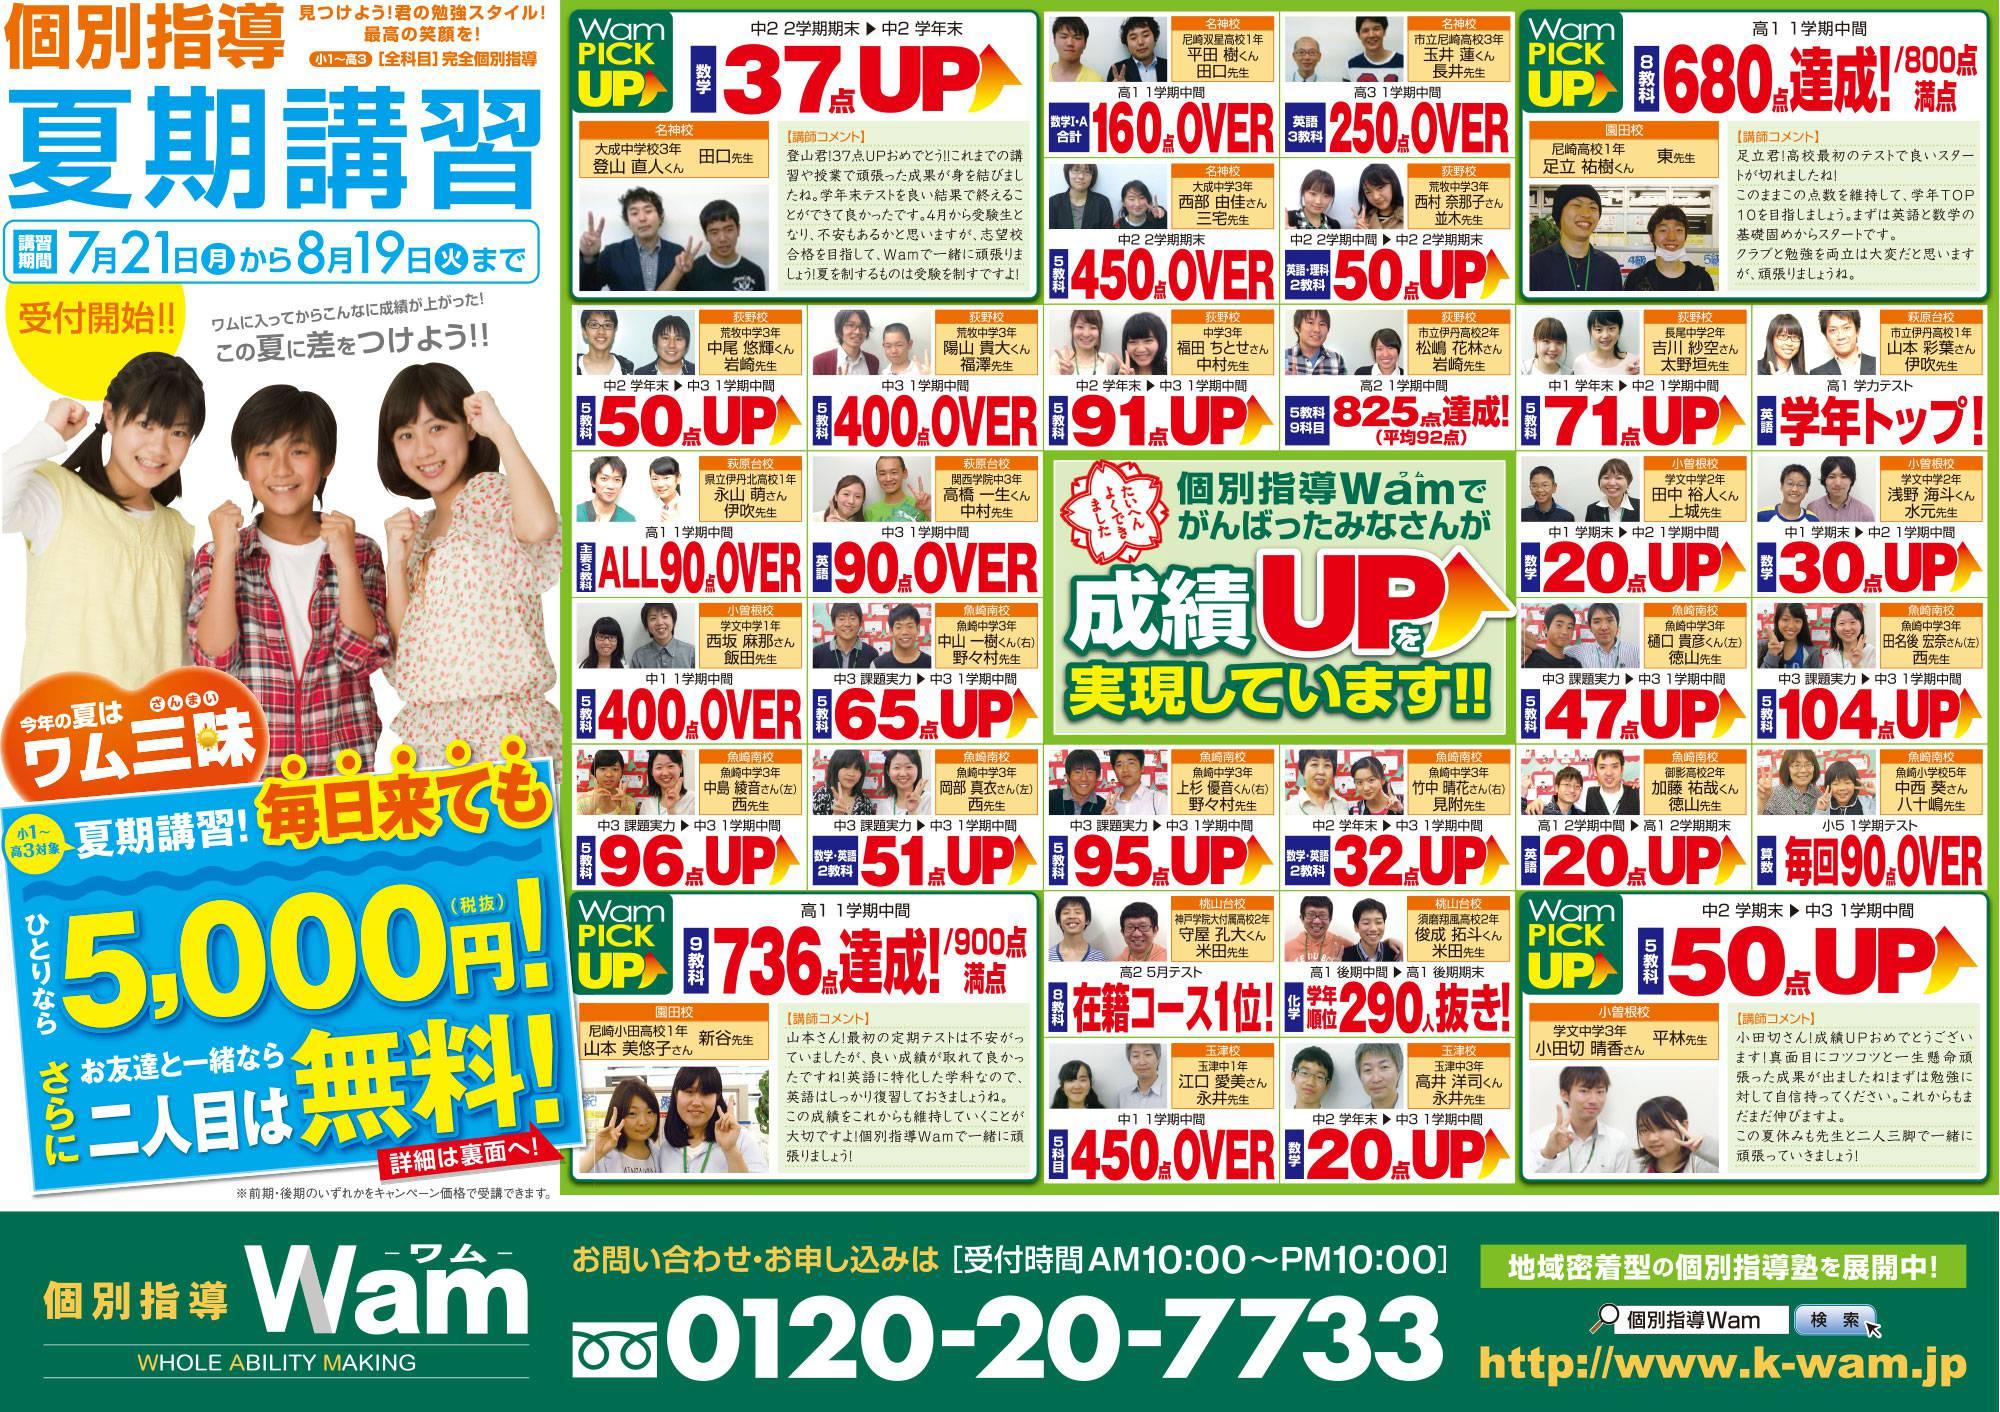 2014年夏期講習 兵庫・オモテ面